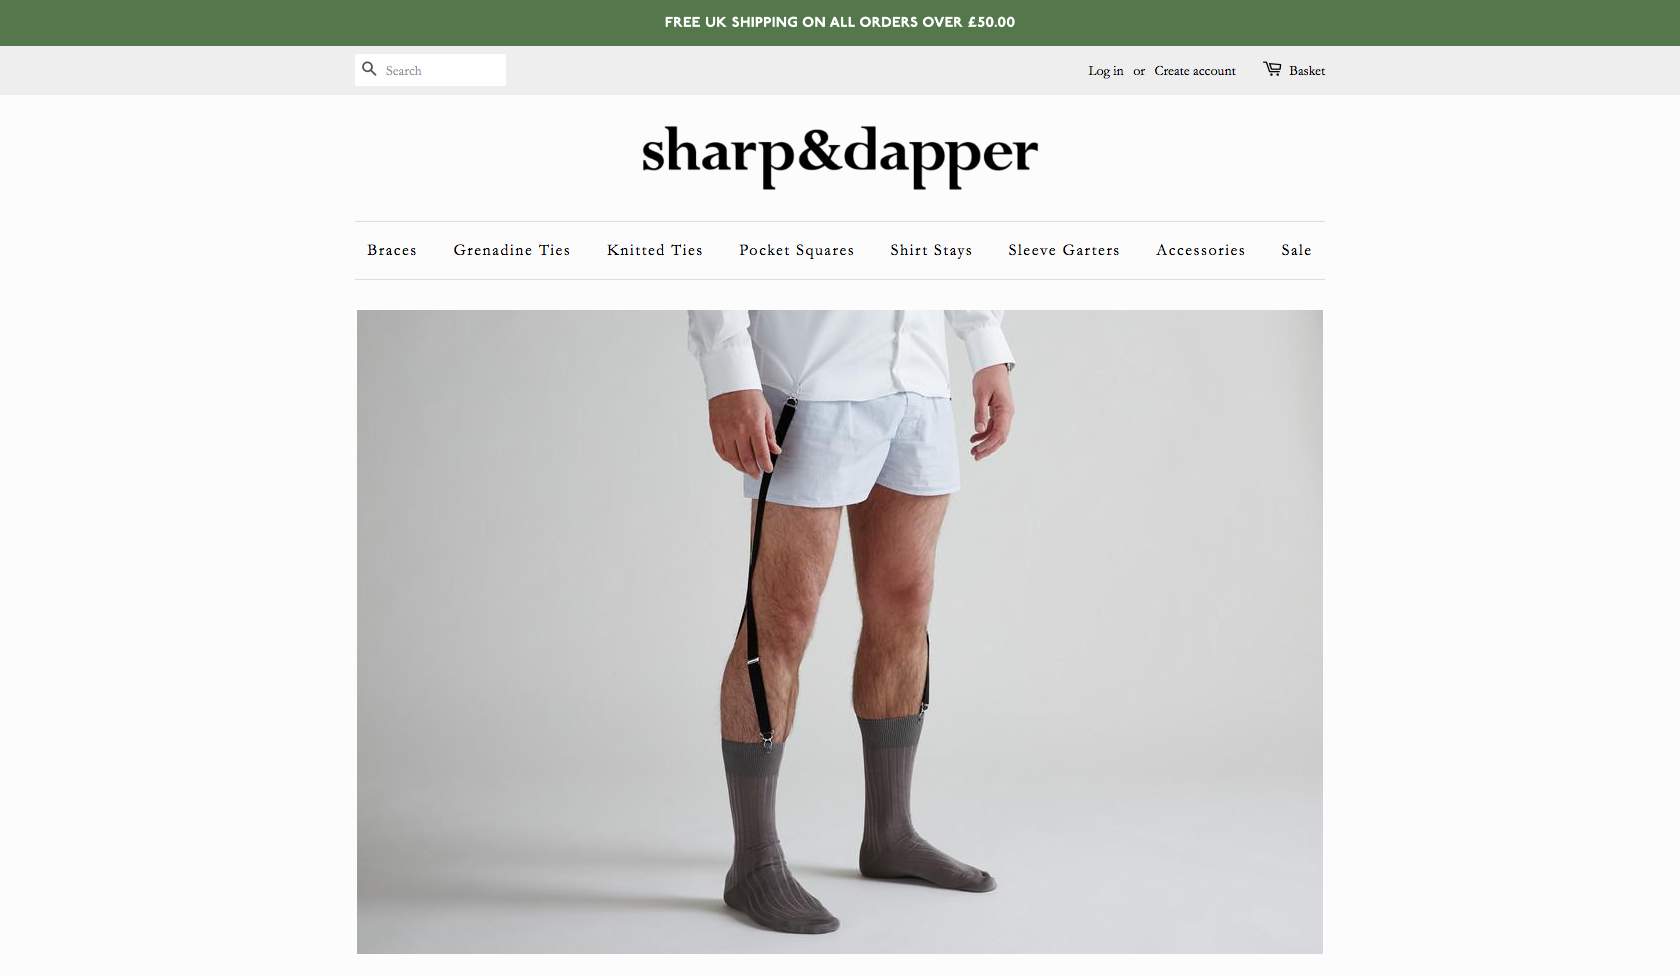 Shirt_Stays,_Ties,_Braces,_Pocket_Squares_&_Accessories_-_sharp&dapper_-_2018-05-17_14.30.55.png